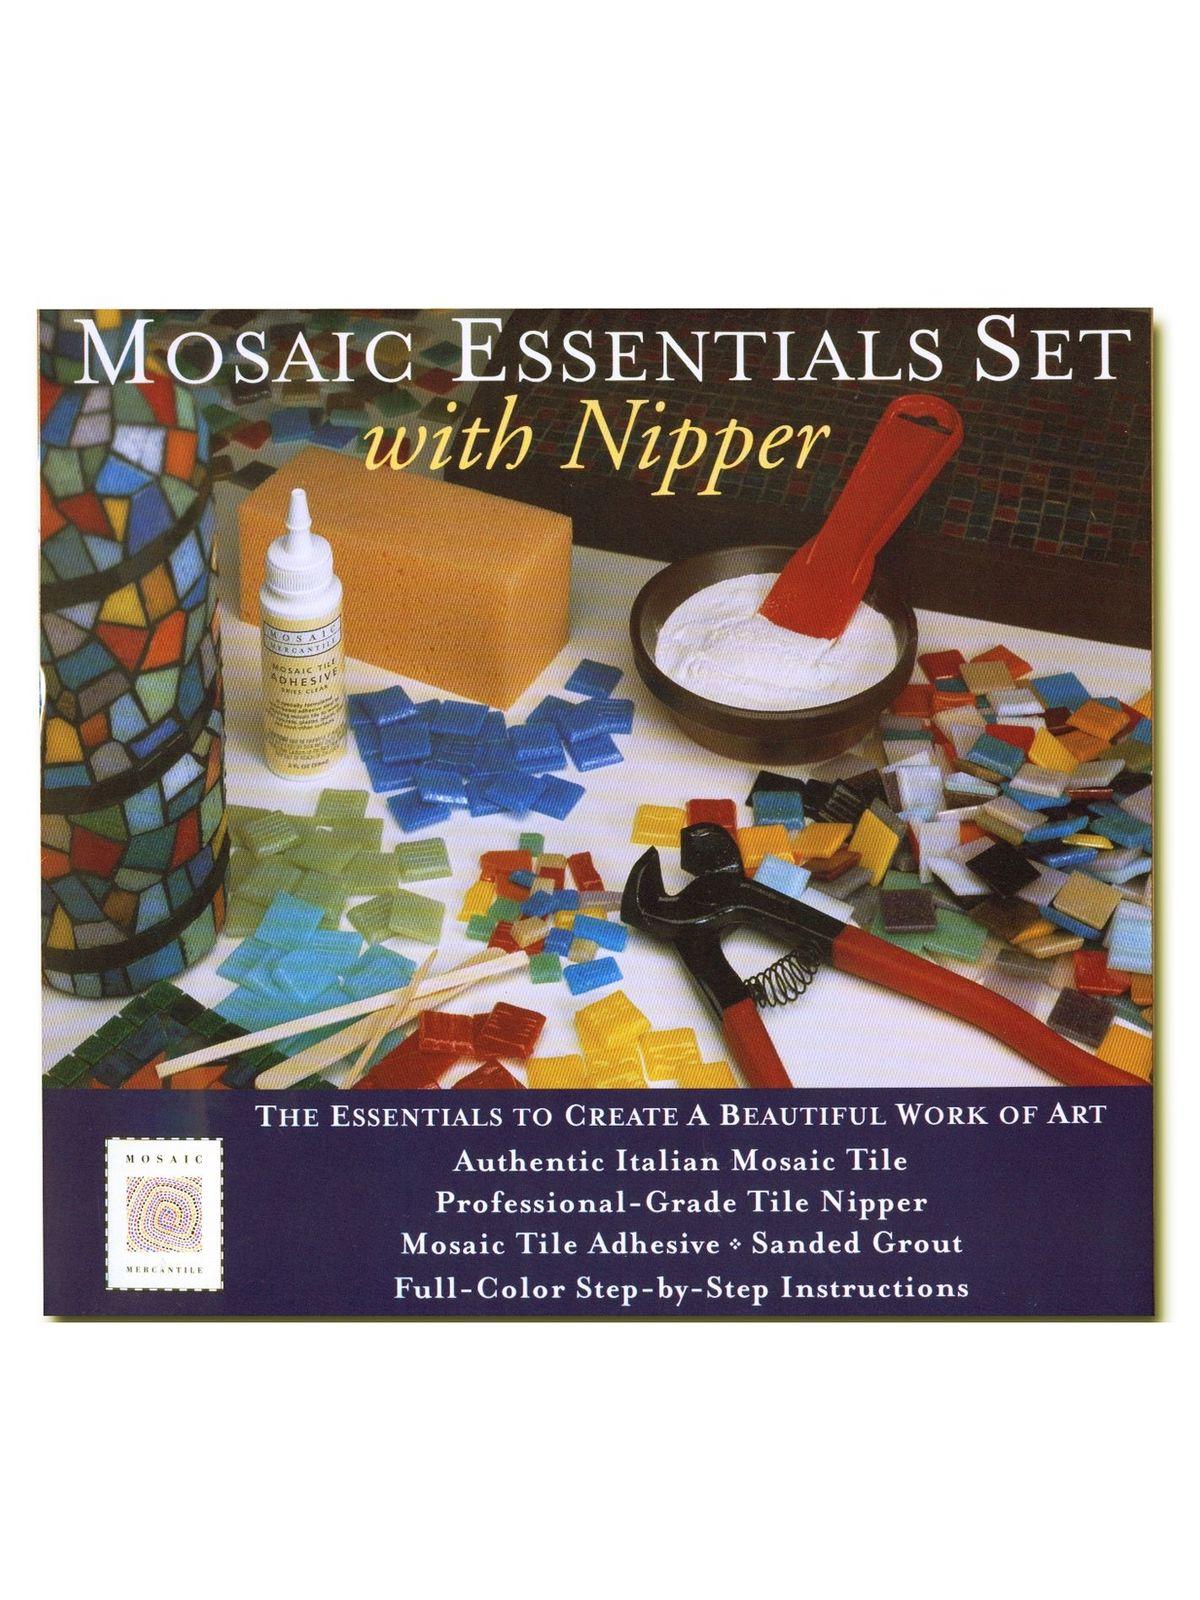 Mosaic Essentials Set with Nipper